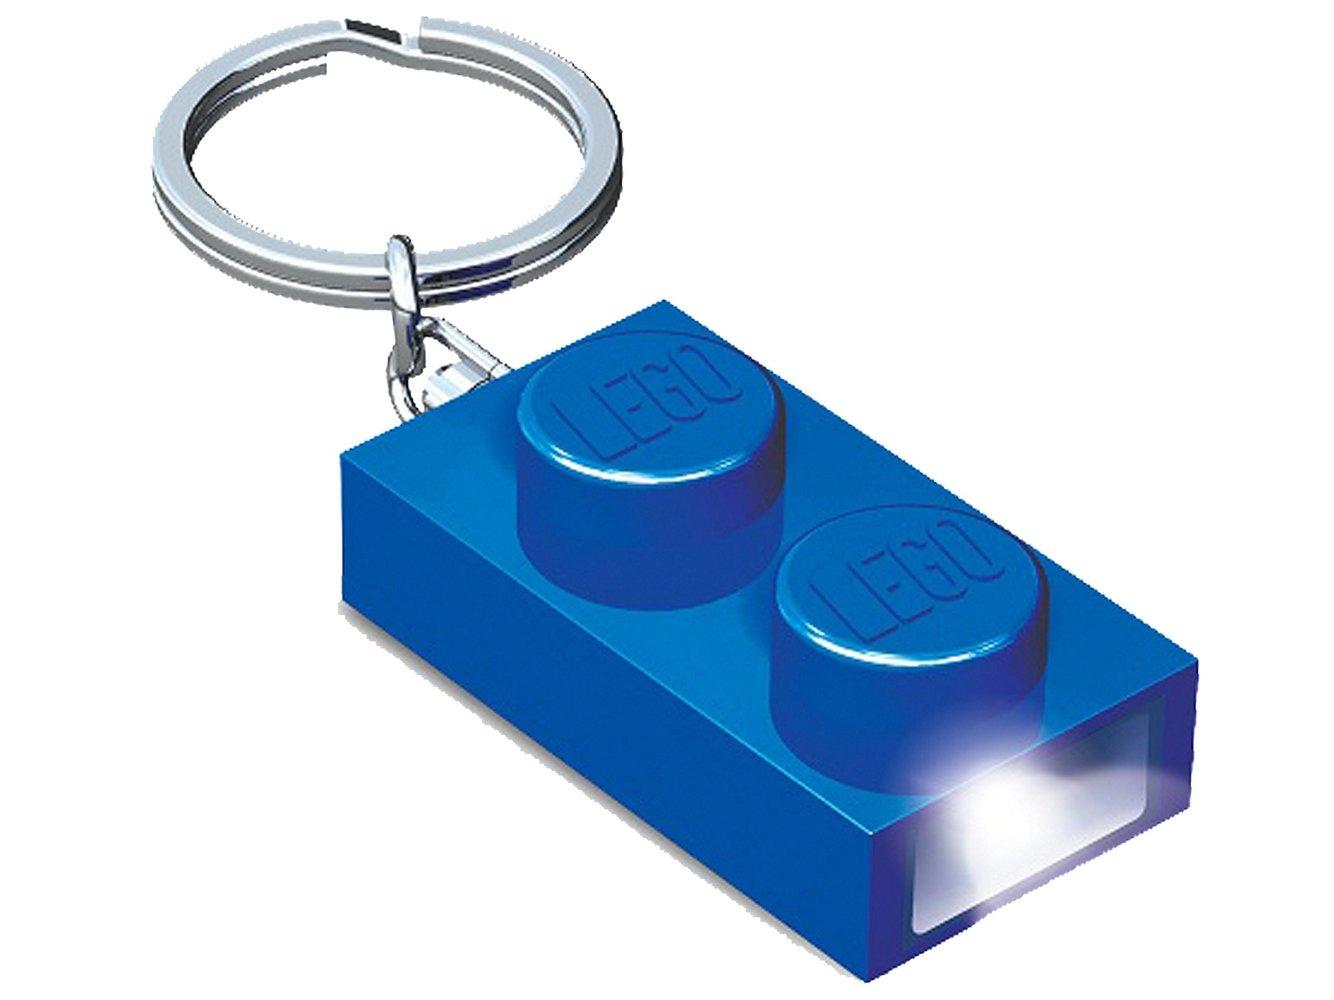 1x2 Brick Key Light (Blue)